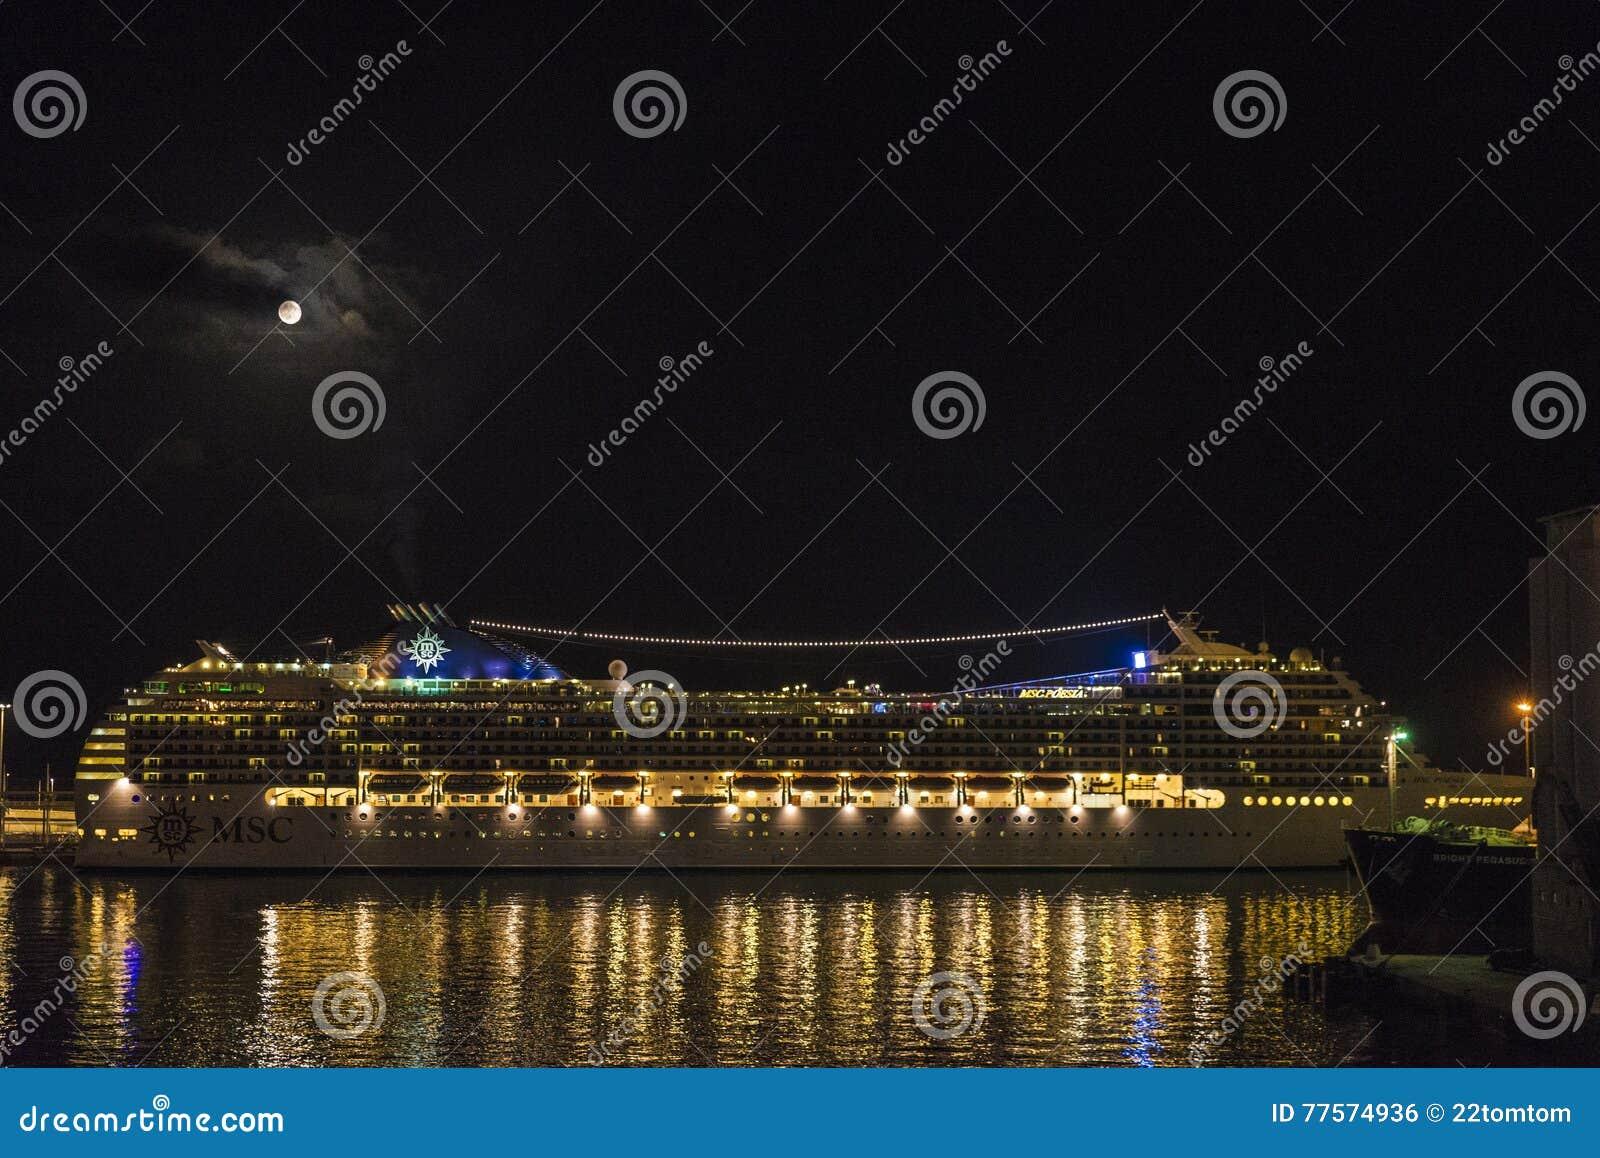 Cruise on a full moon night, Barcelona